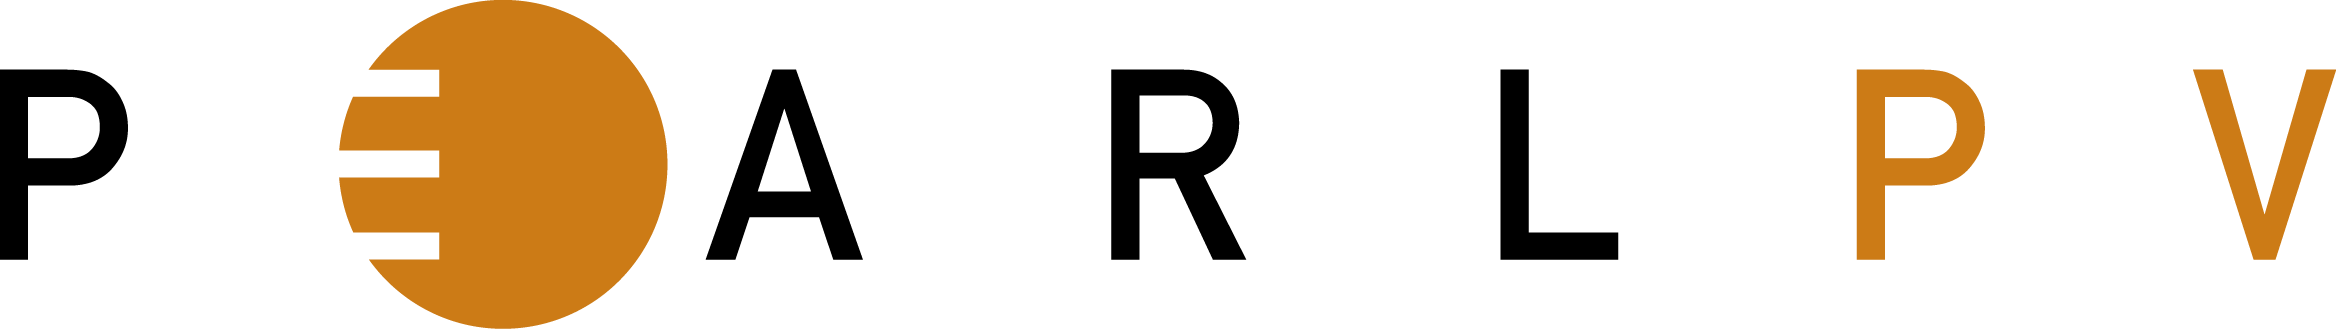 Pearl-PV logo